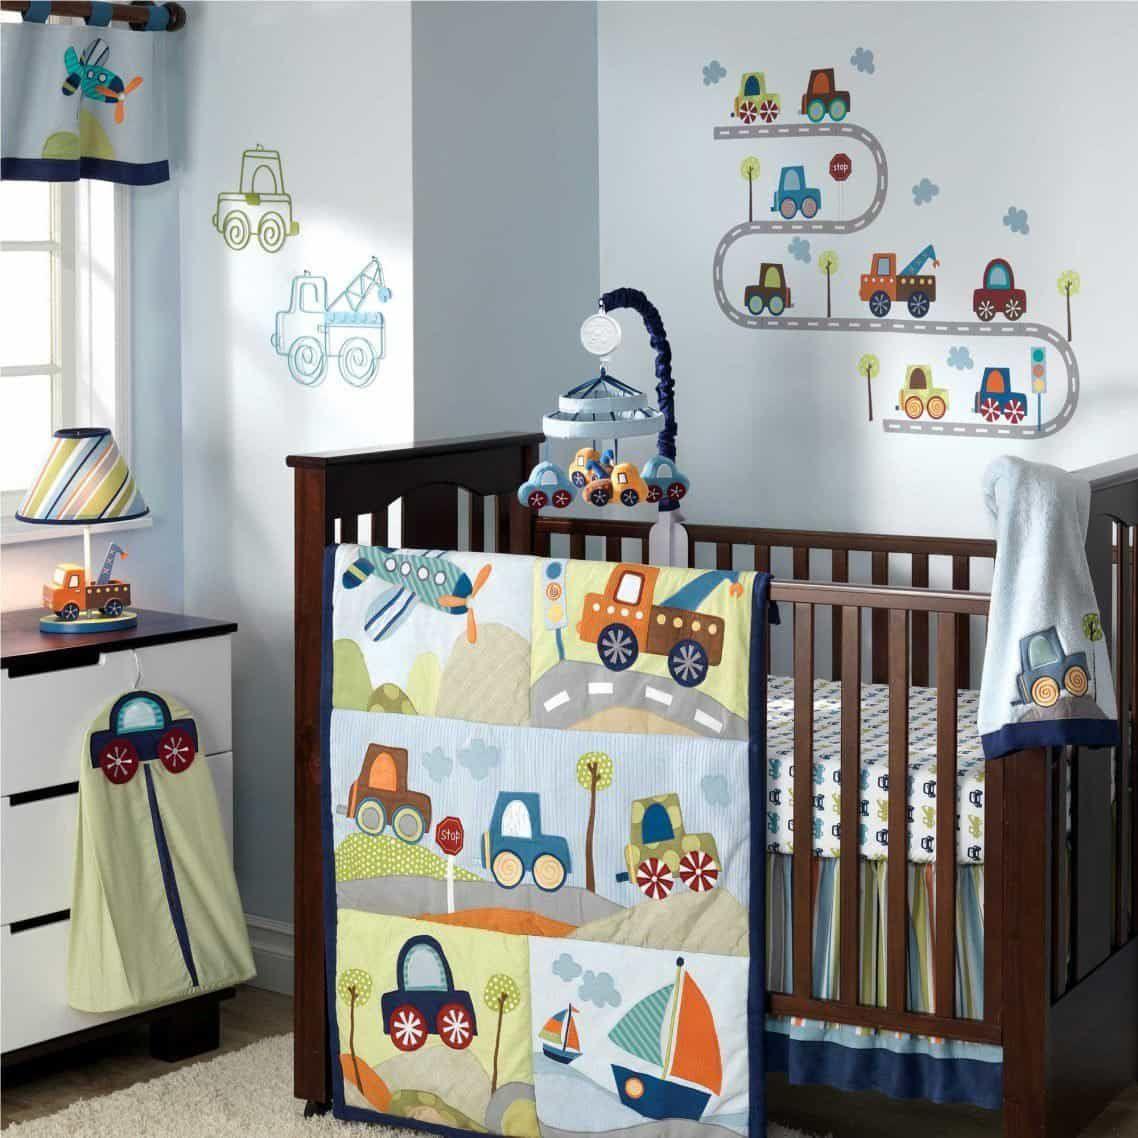 Choosing Baby Boy Crib Bedding Baby Boy Room Themes Baby Boy Room Nursery Baby Crib Bedding Sets